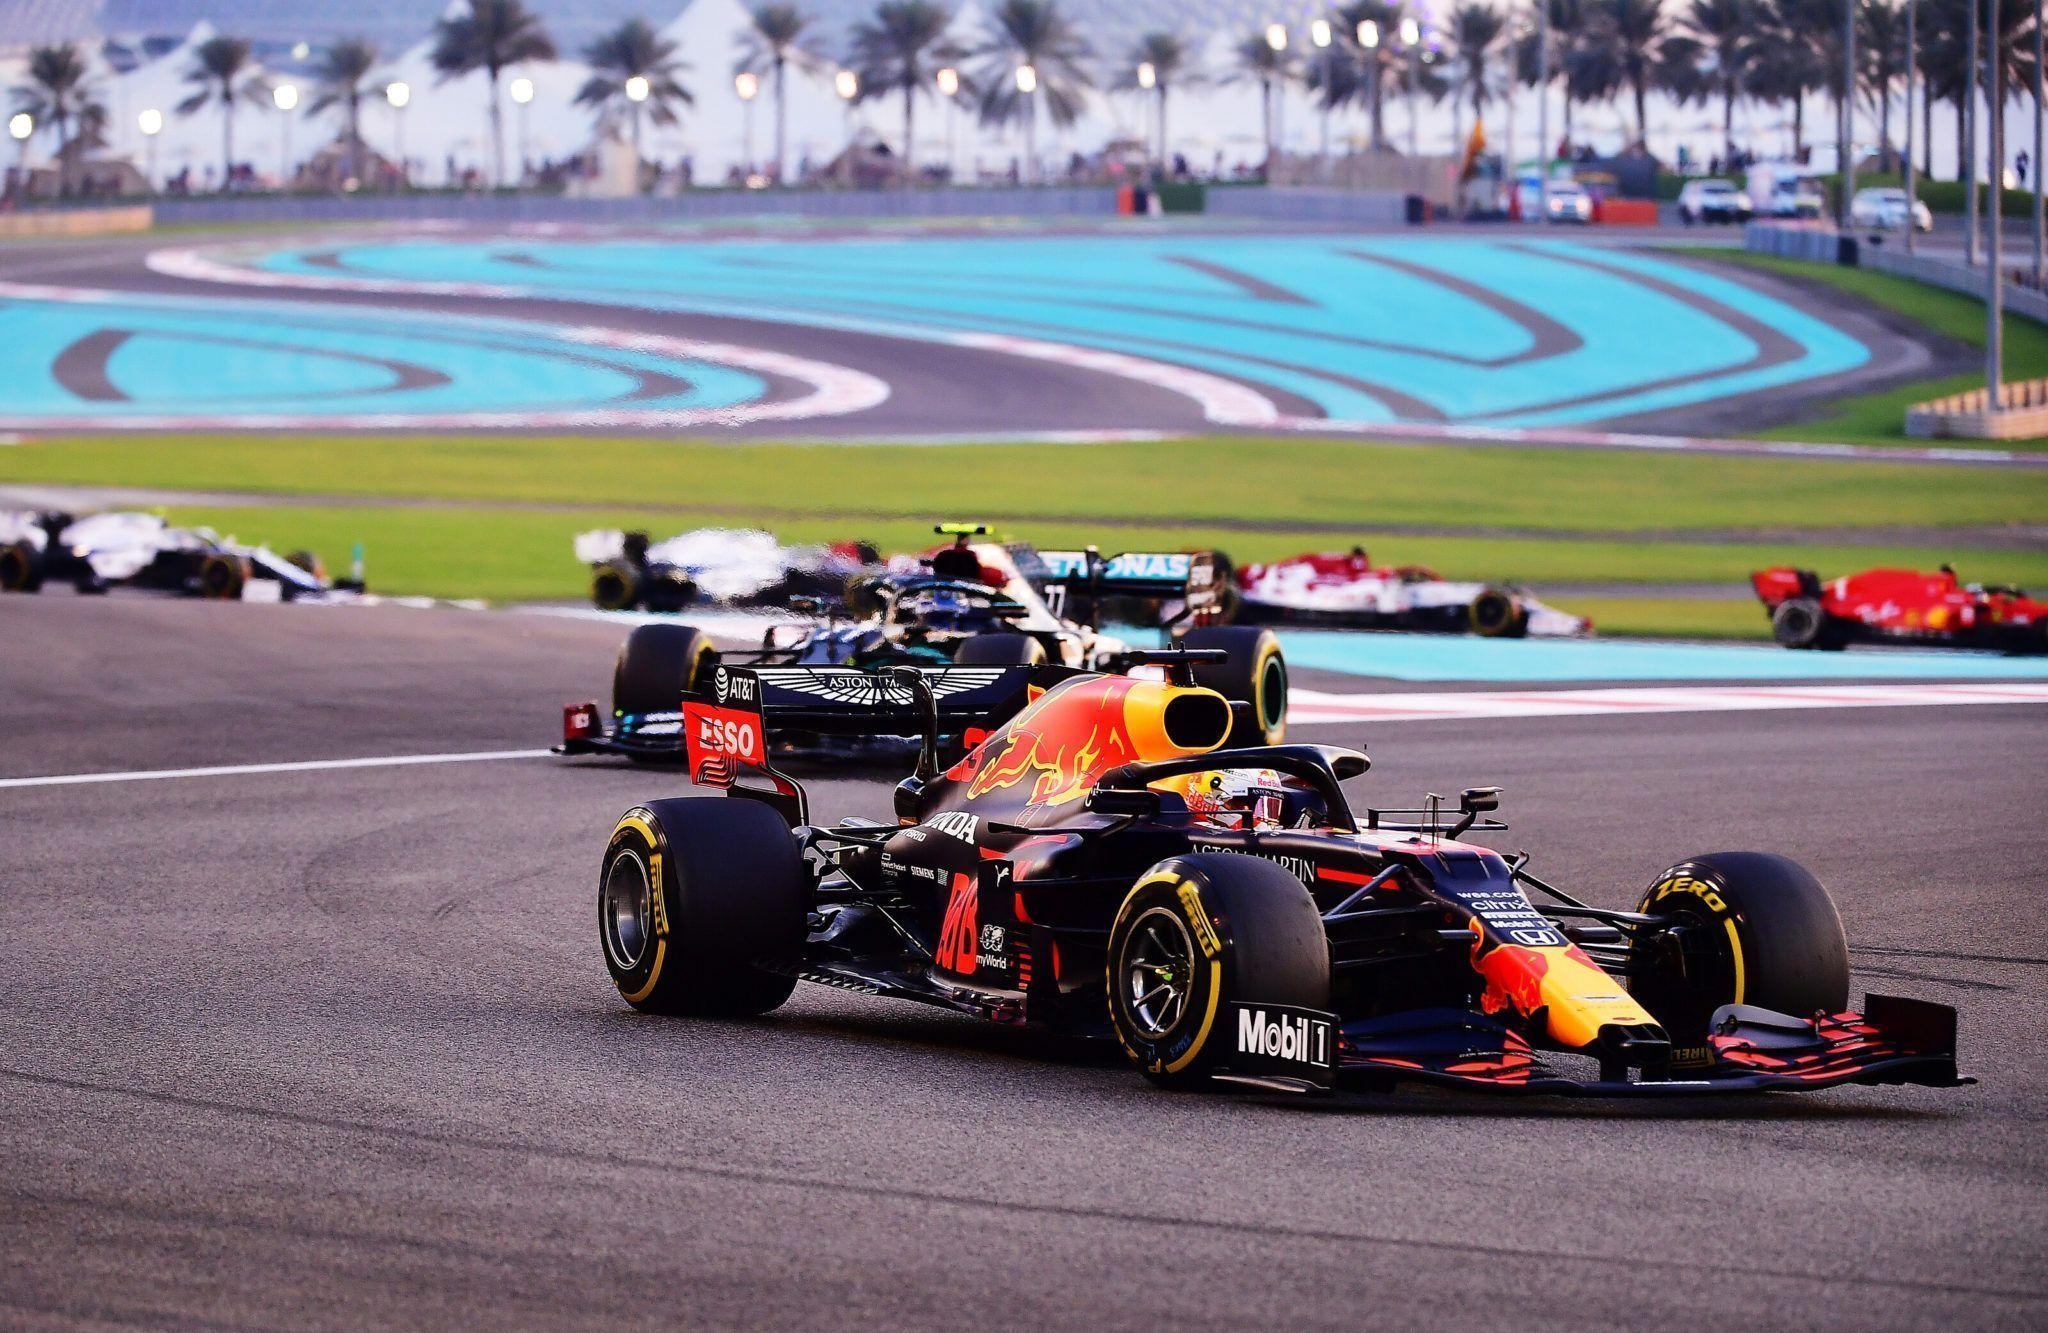 F1, Abu Dhabi GP, Max Verstappen